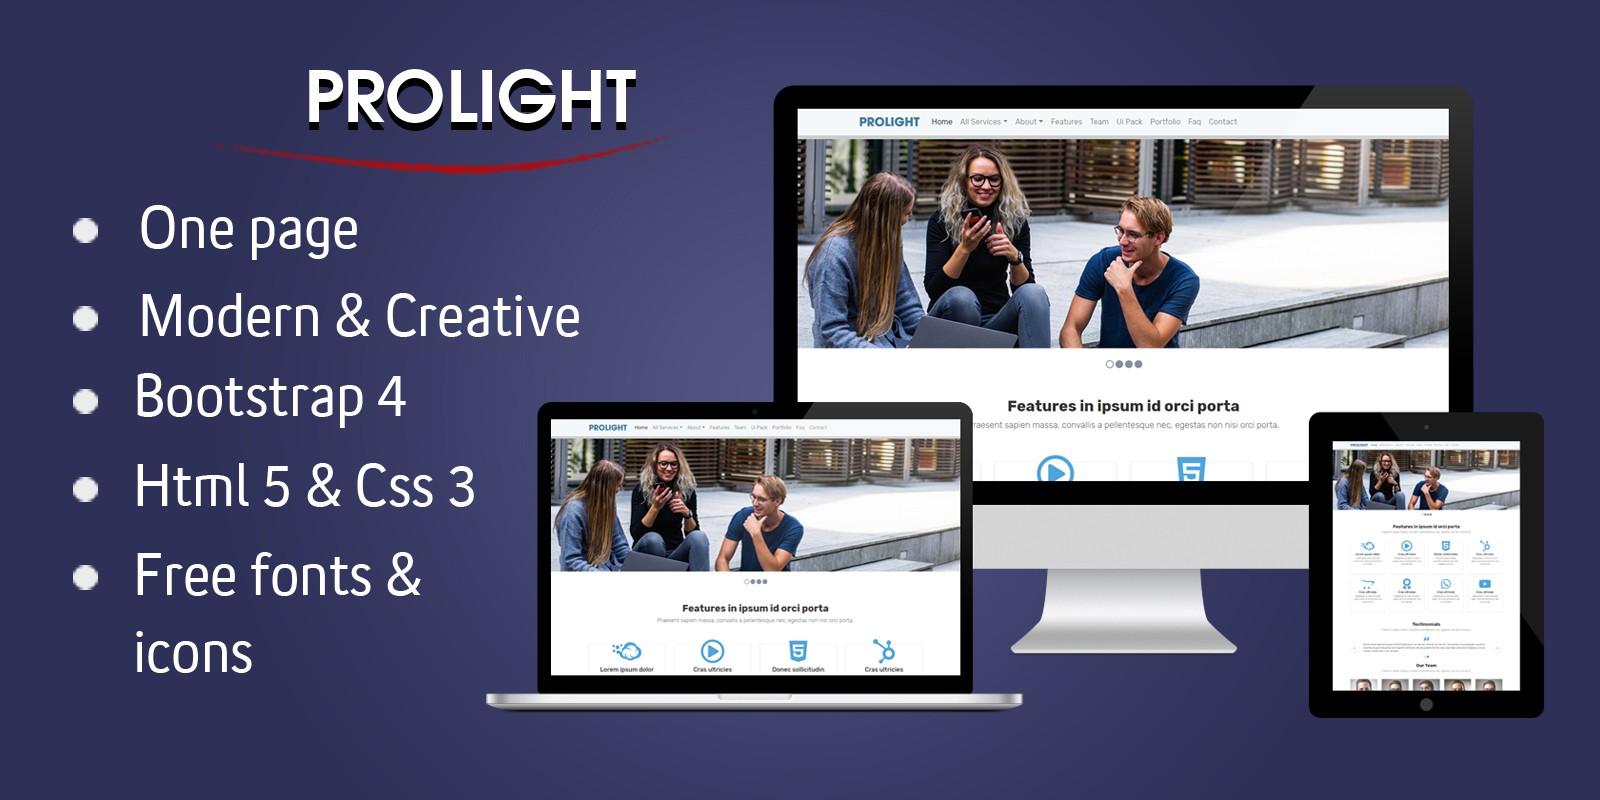 Prolight - Creative App Landing Page